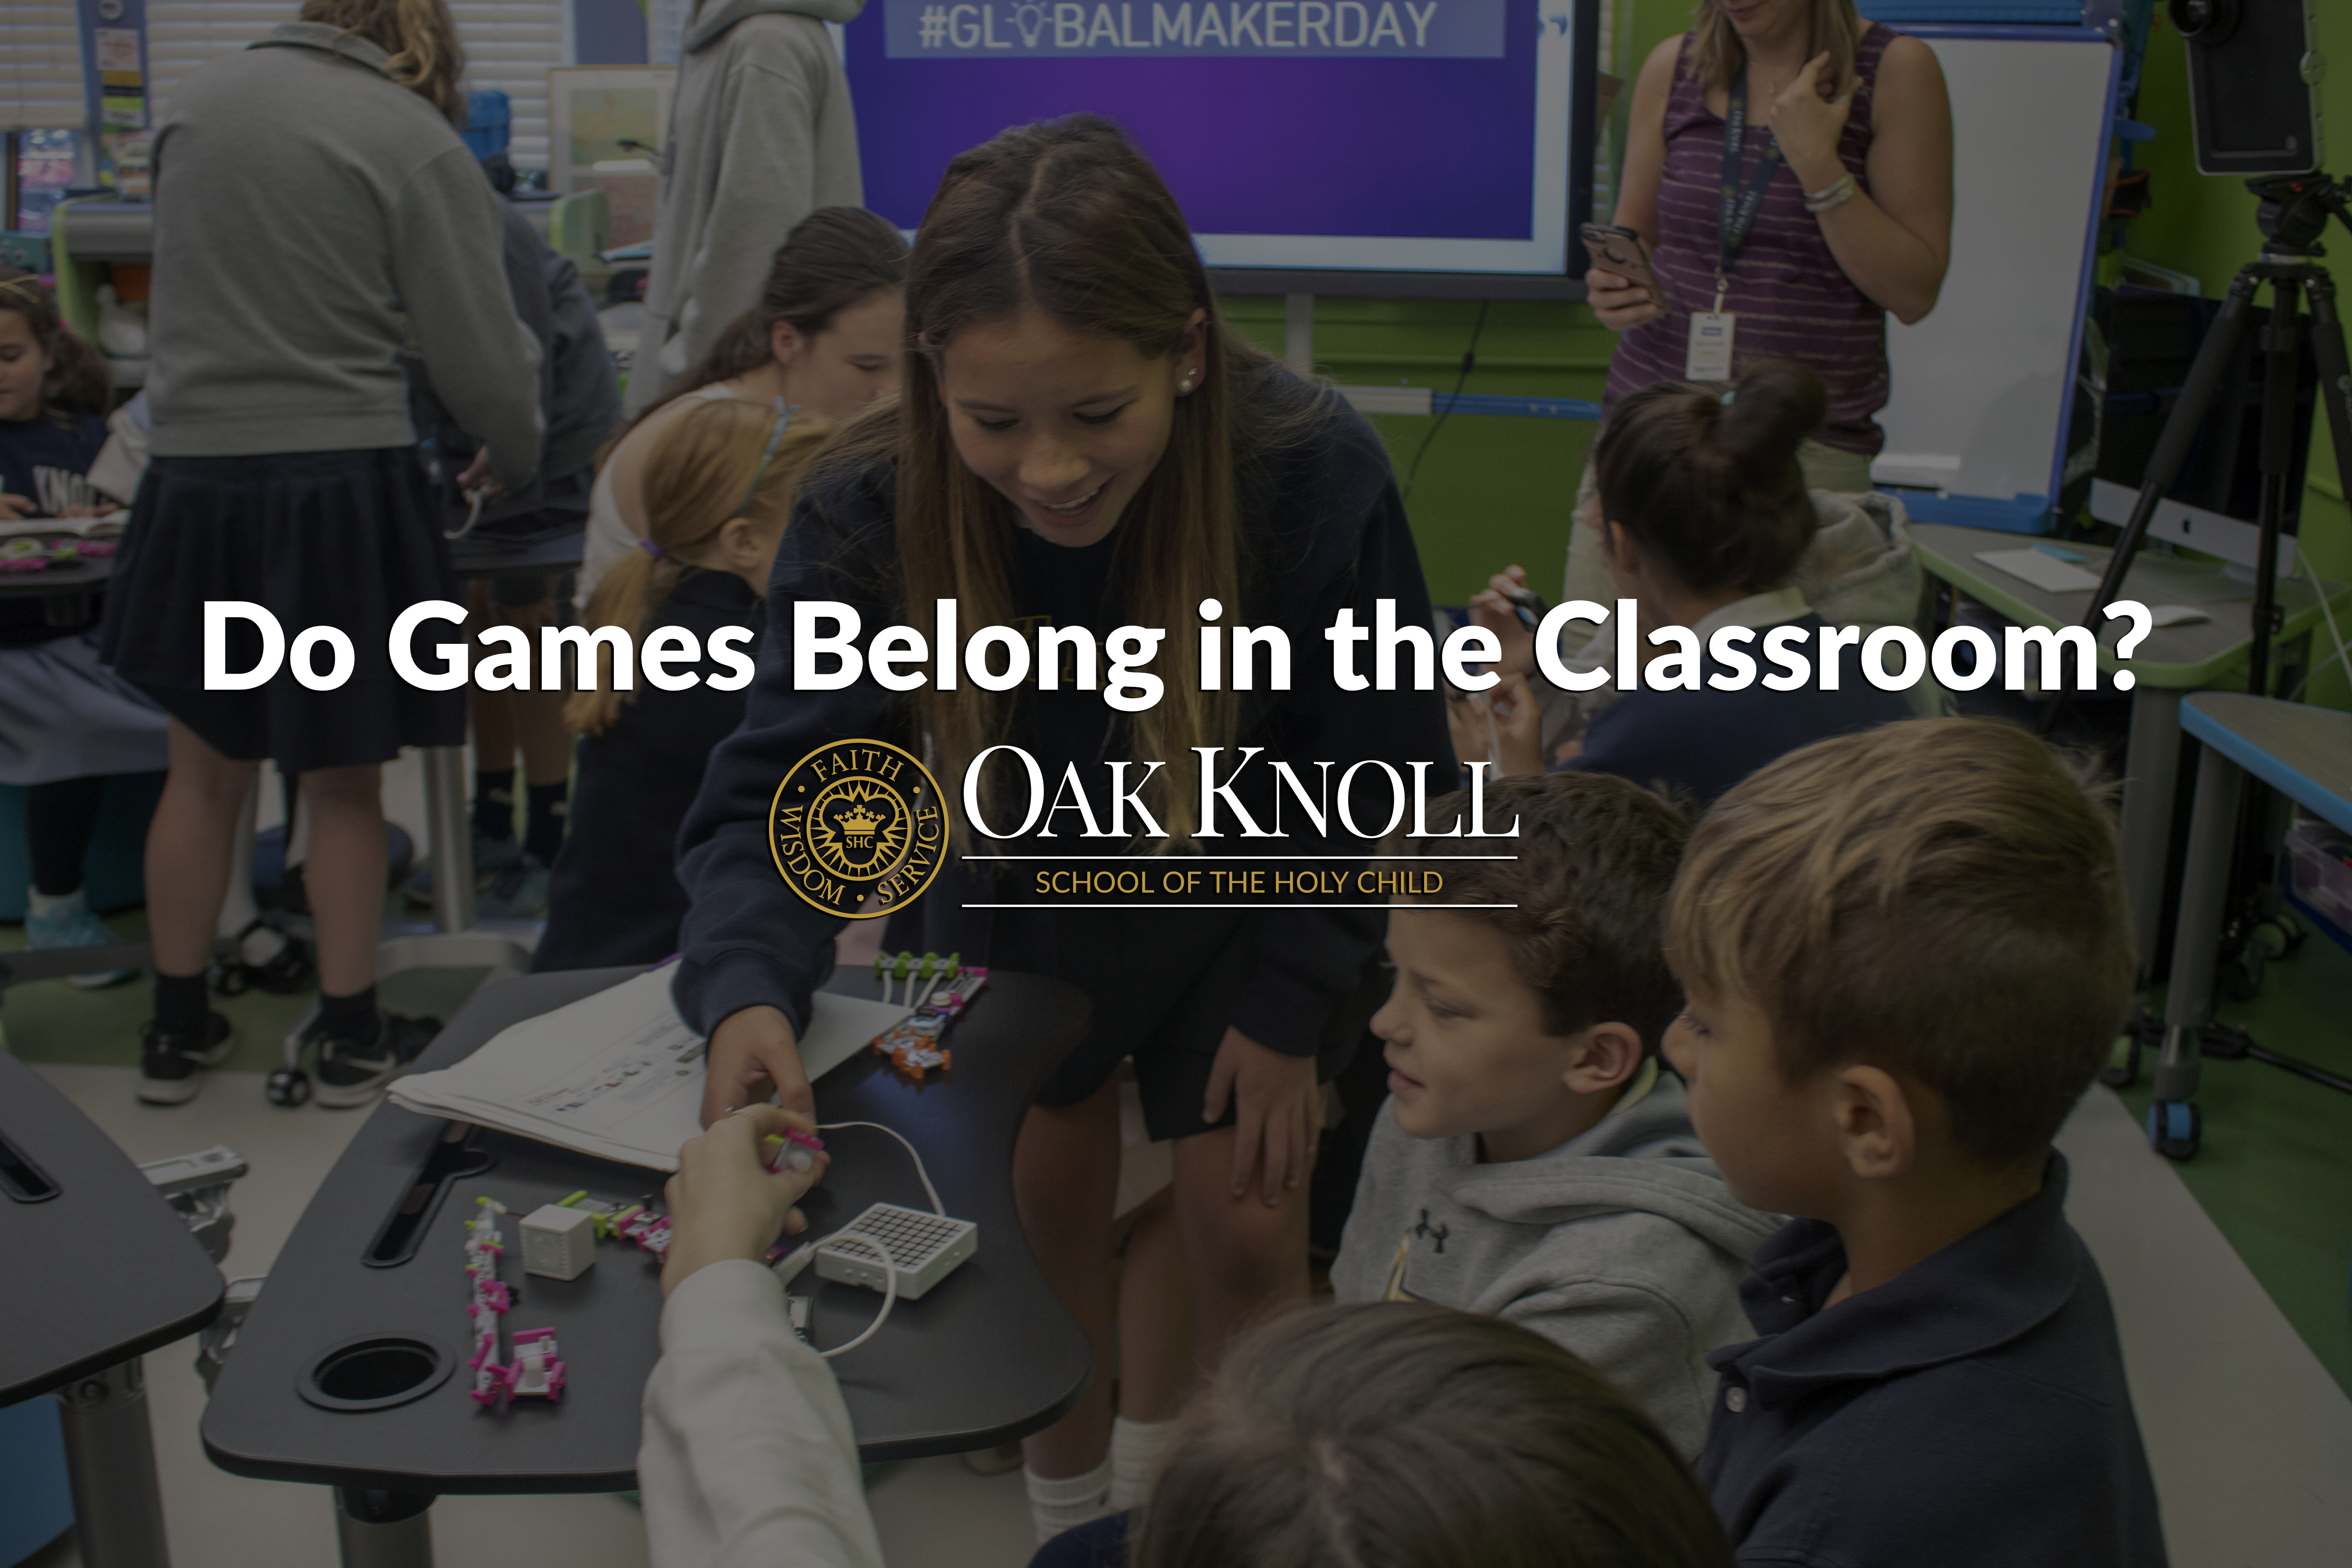 Do Games Belong in the Classroom